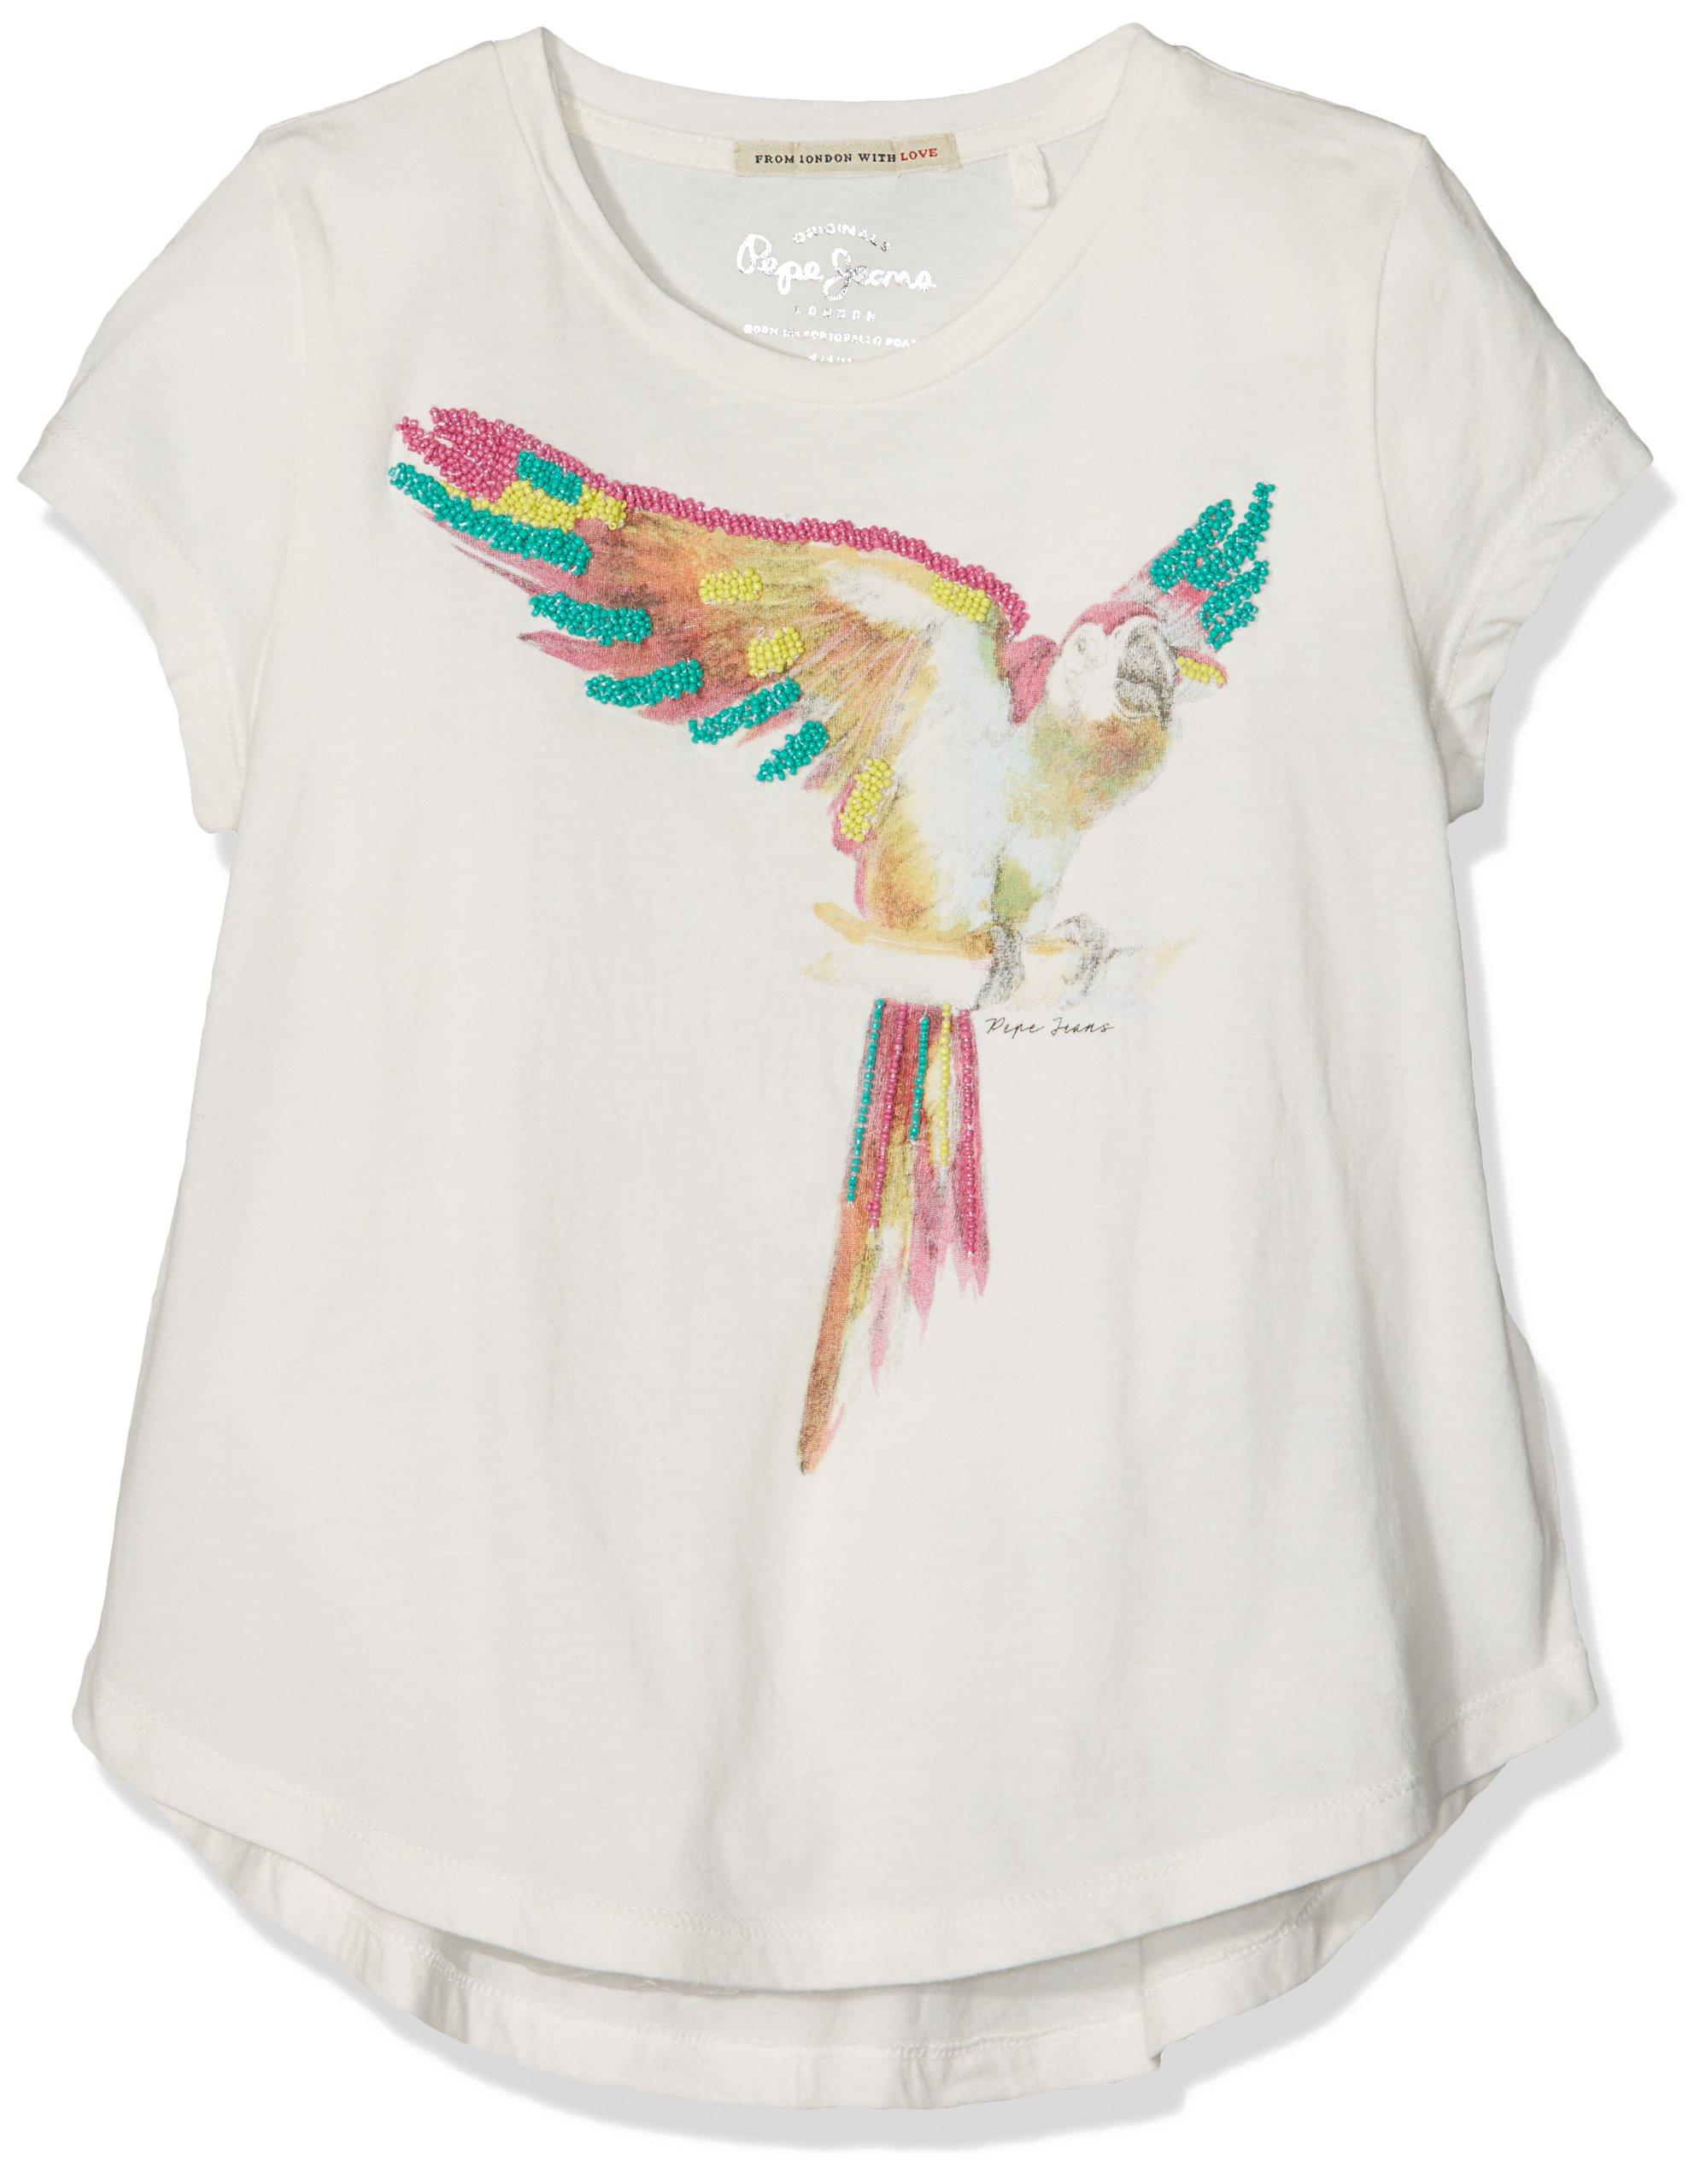 Pepe Jeans Carina Jr Camiseta para Niños